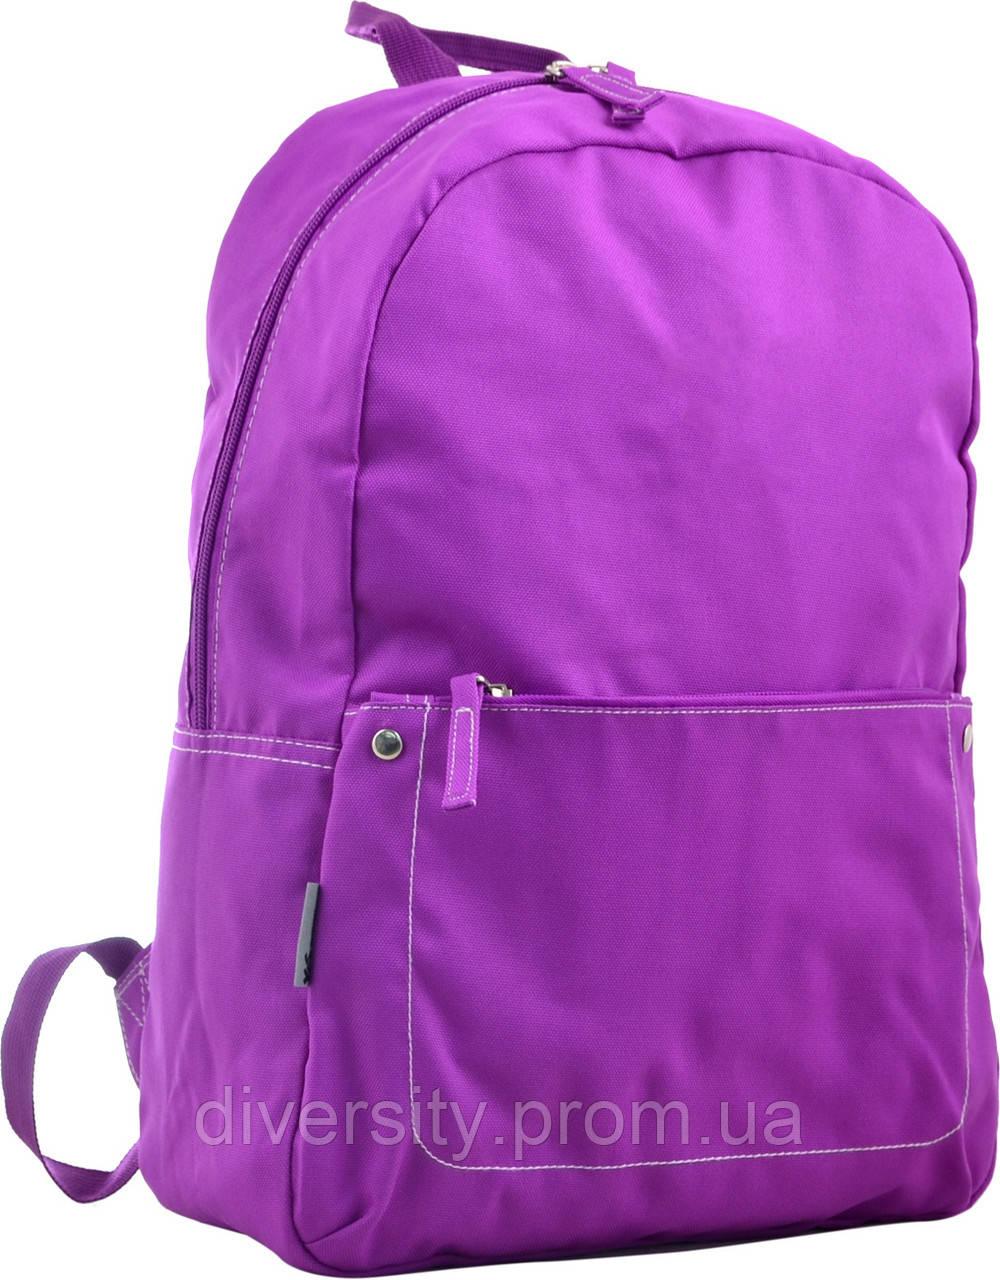 Молодежный рюкзак YES  ST-21 Purple haze, 40*26.5*12